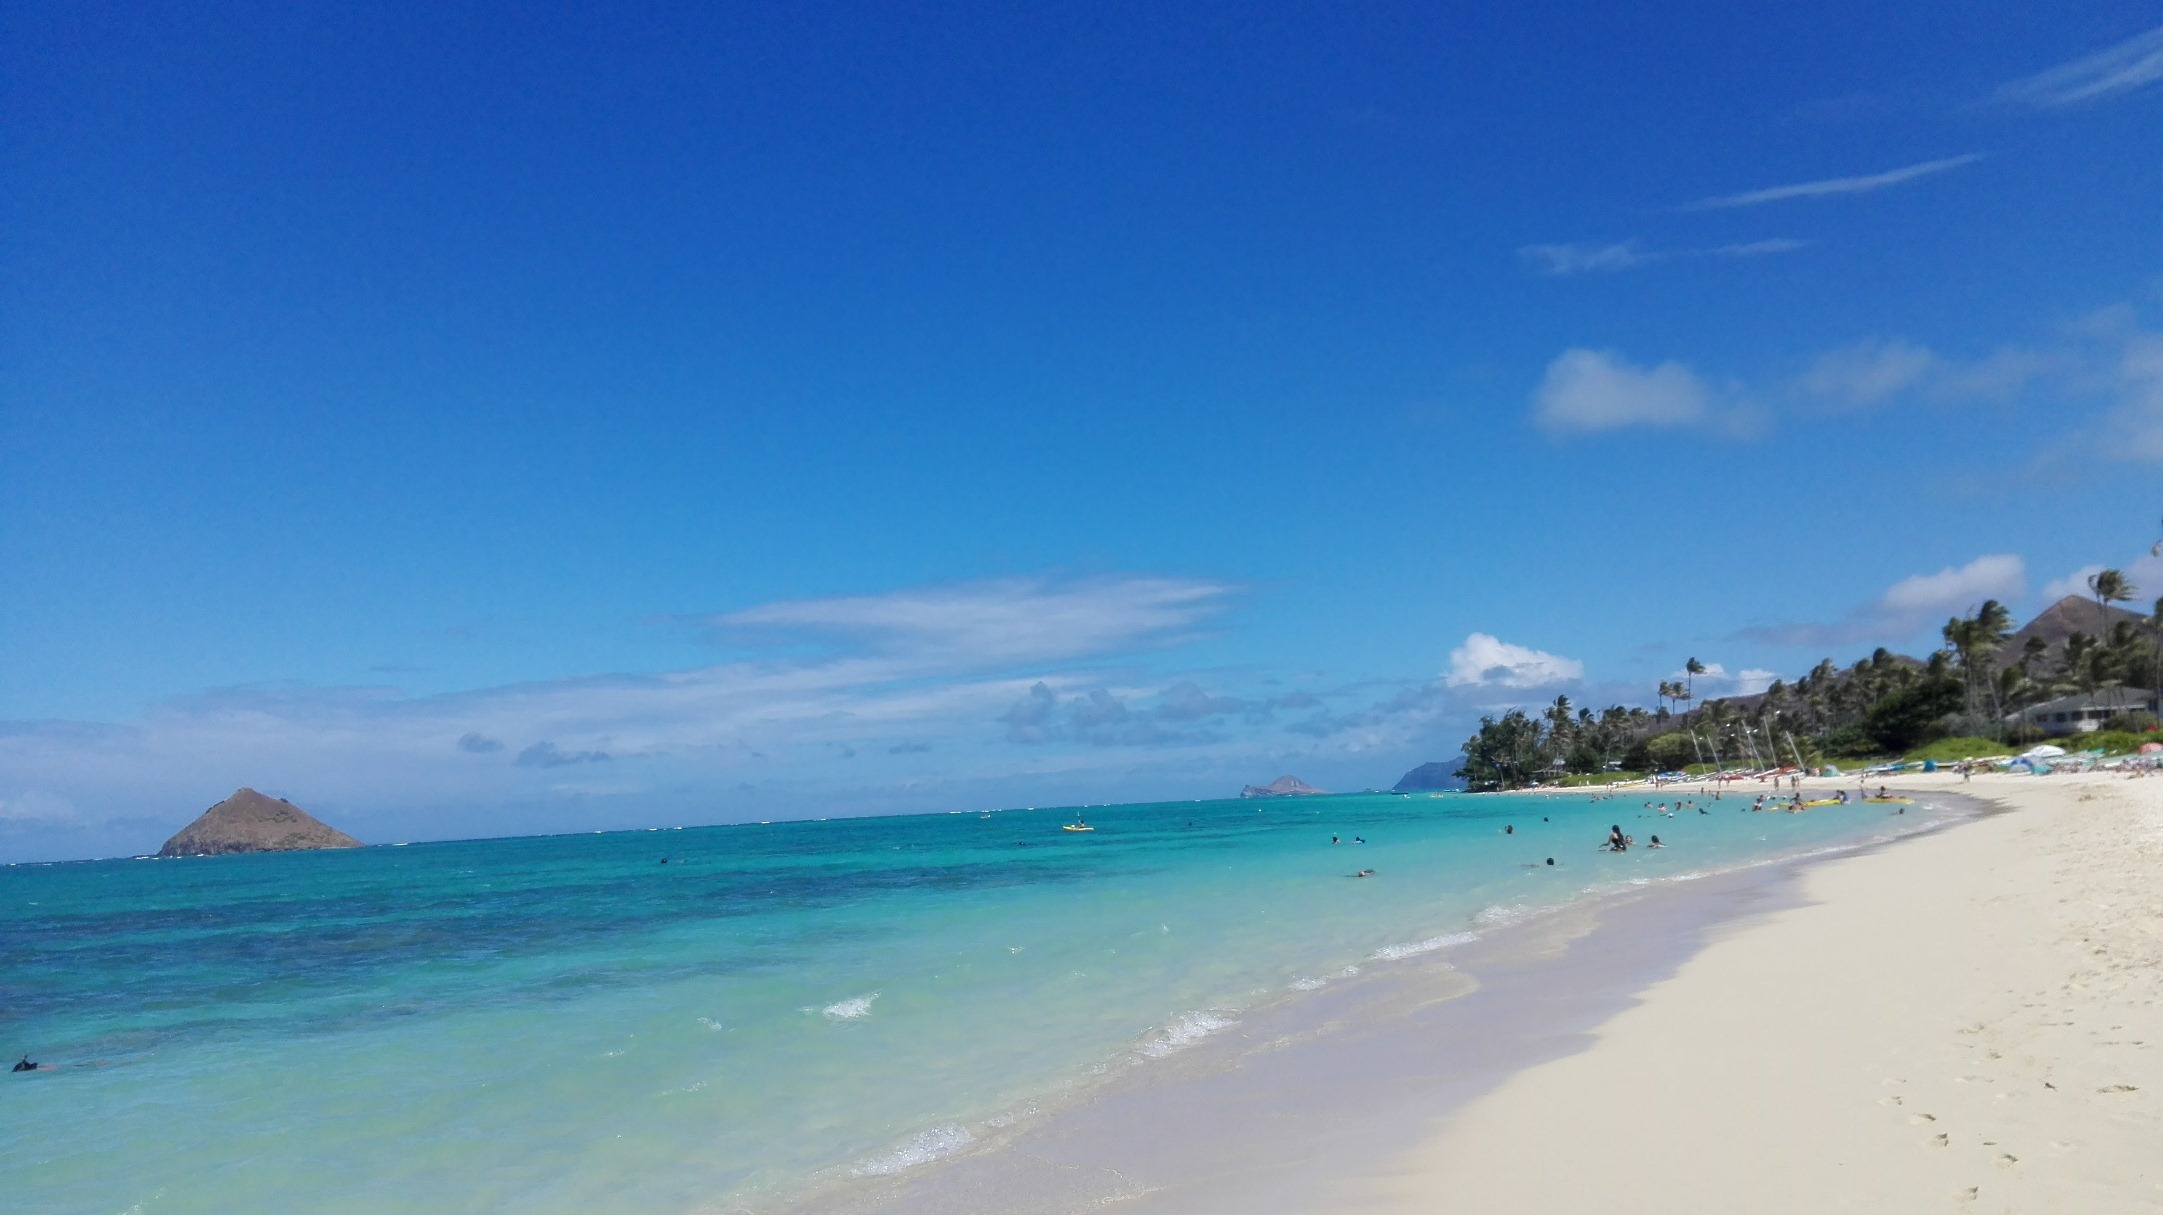 LANIKAI BEACH - HAWAII